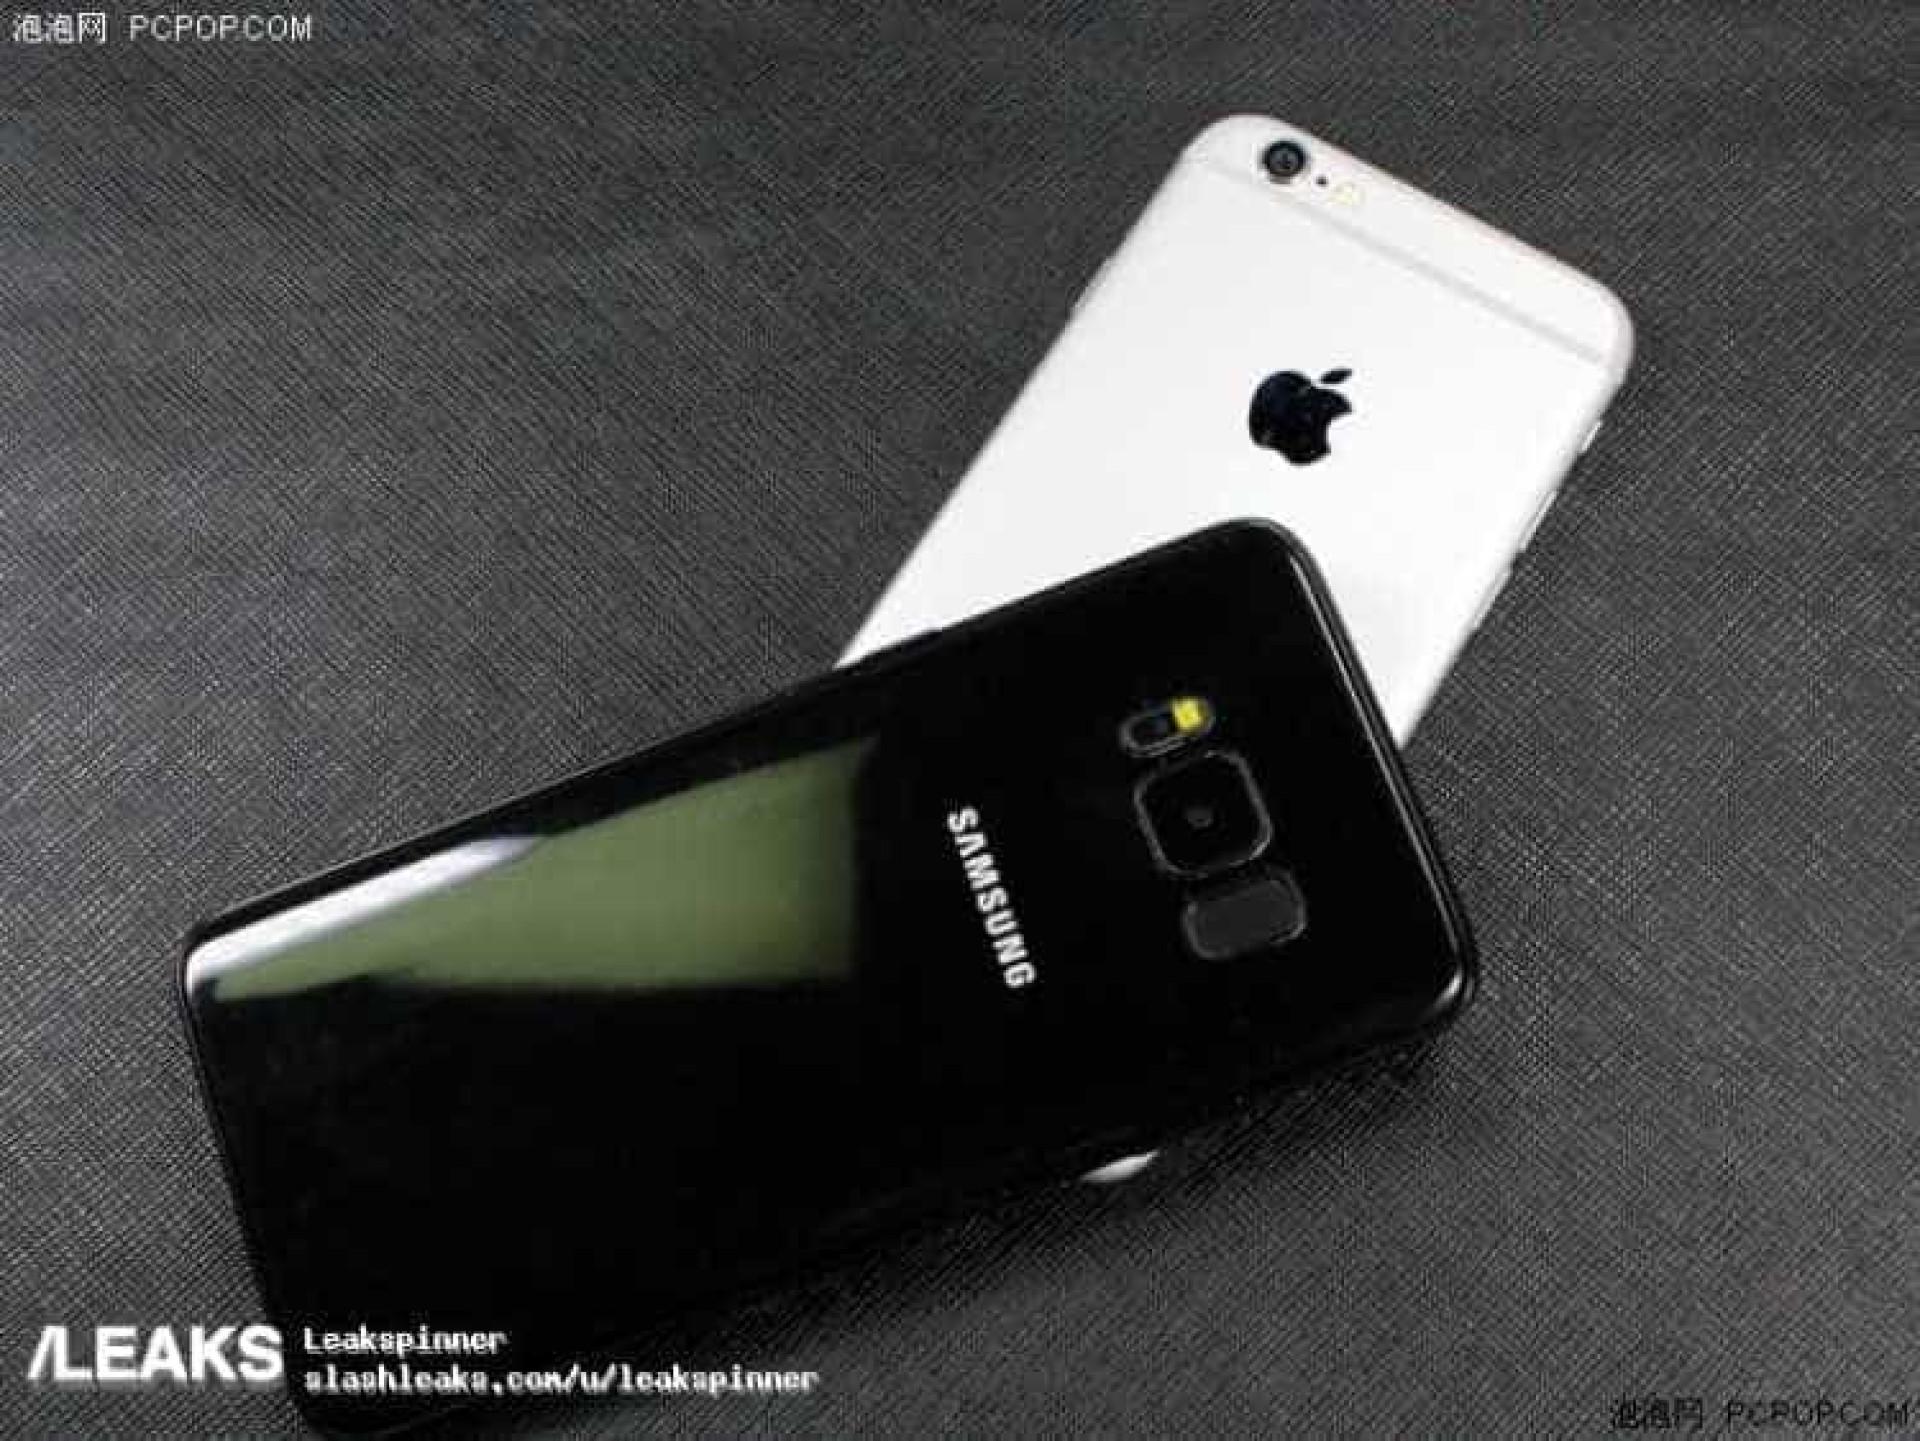 Veja como se compara o Galaxy S8 ao iPhone 6